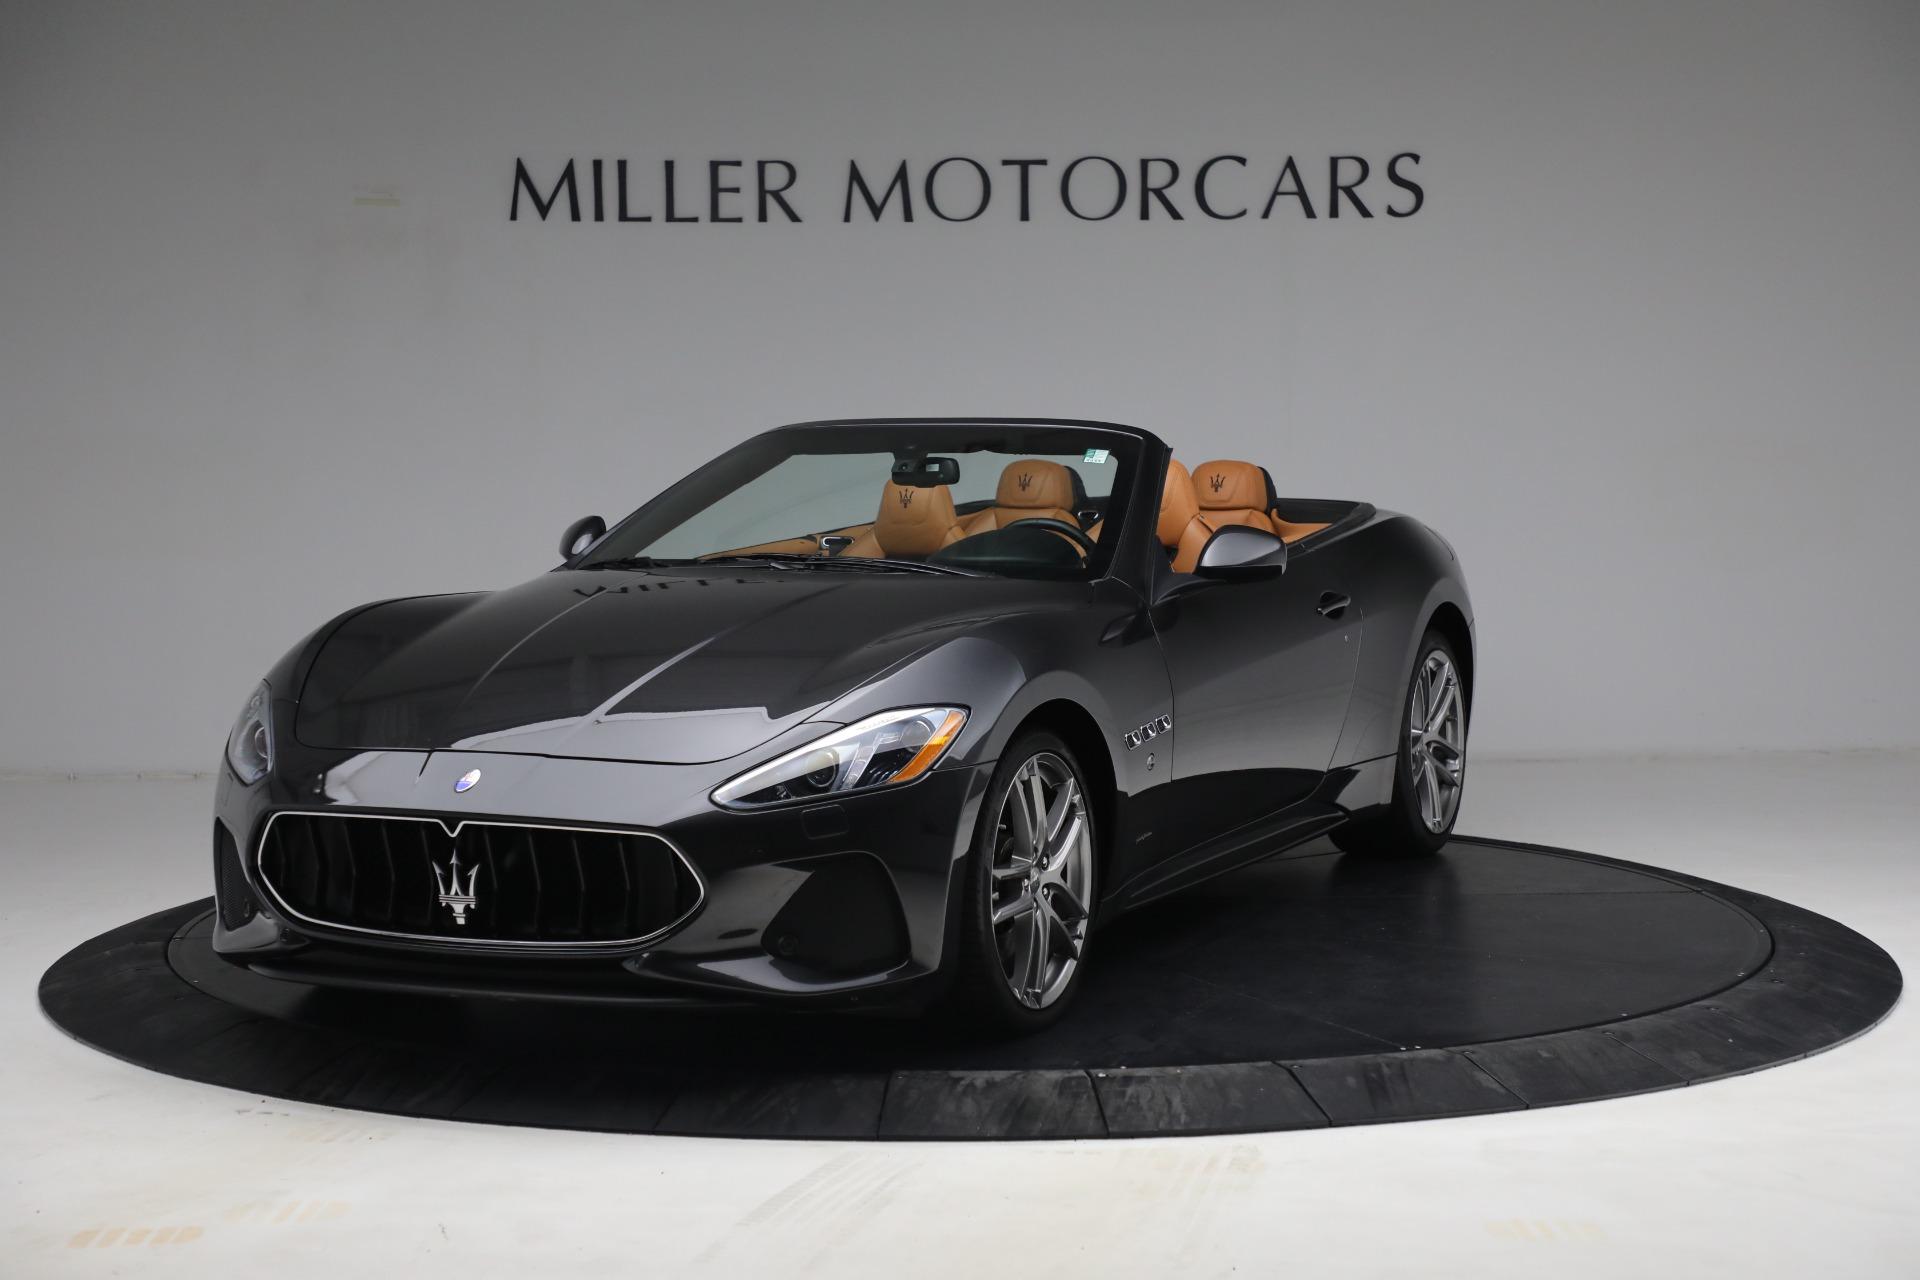 Used 2018 Maserati GranTurismo Sport for sale Call for price at Pagani of Greenwich in Greenwich CT 06830 1